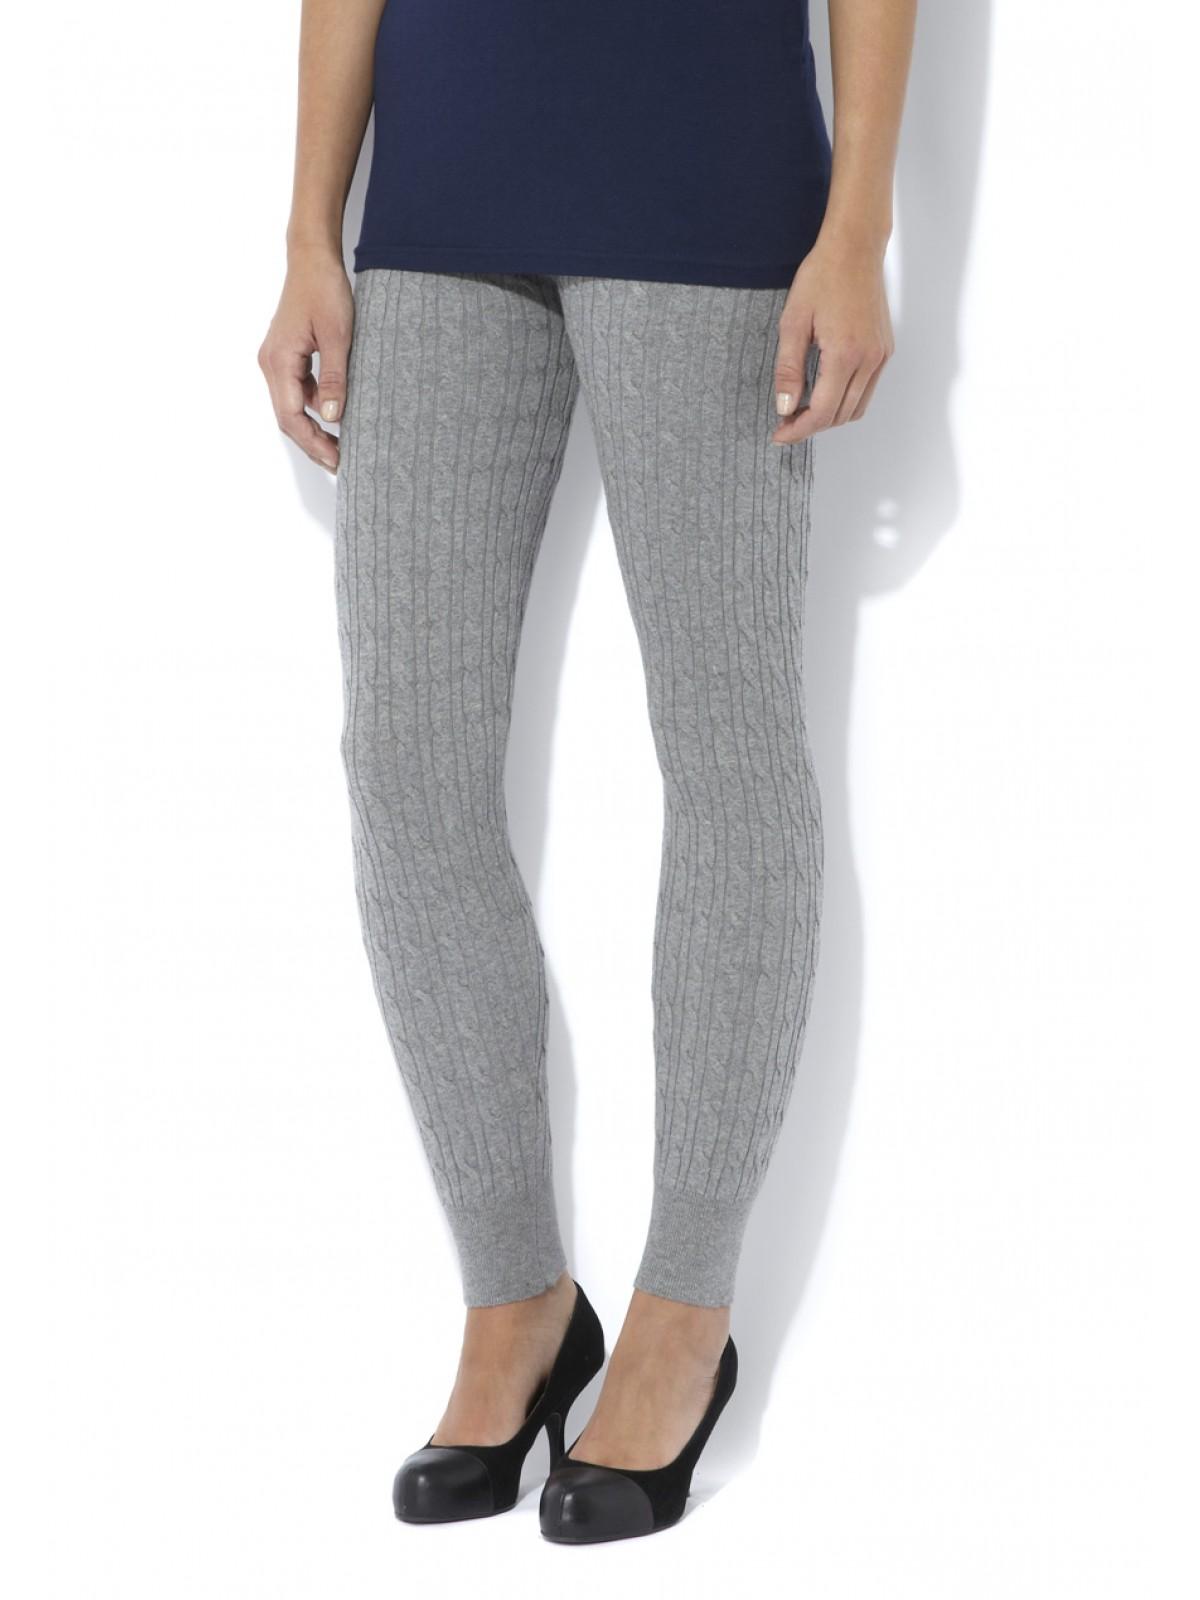 cable knit leggings cableknit leggings qlaitvk